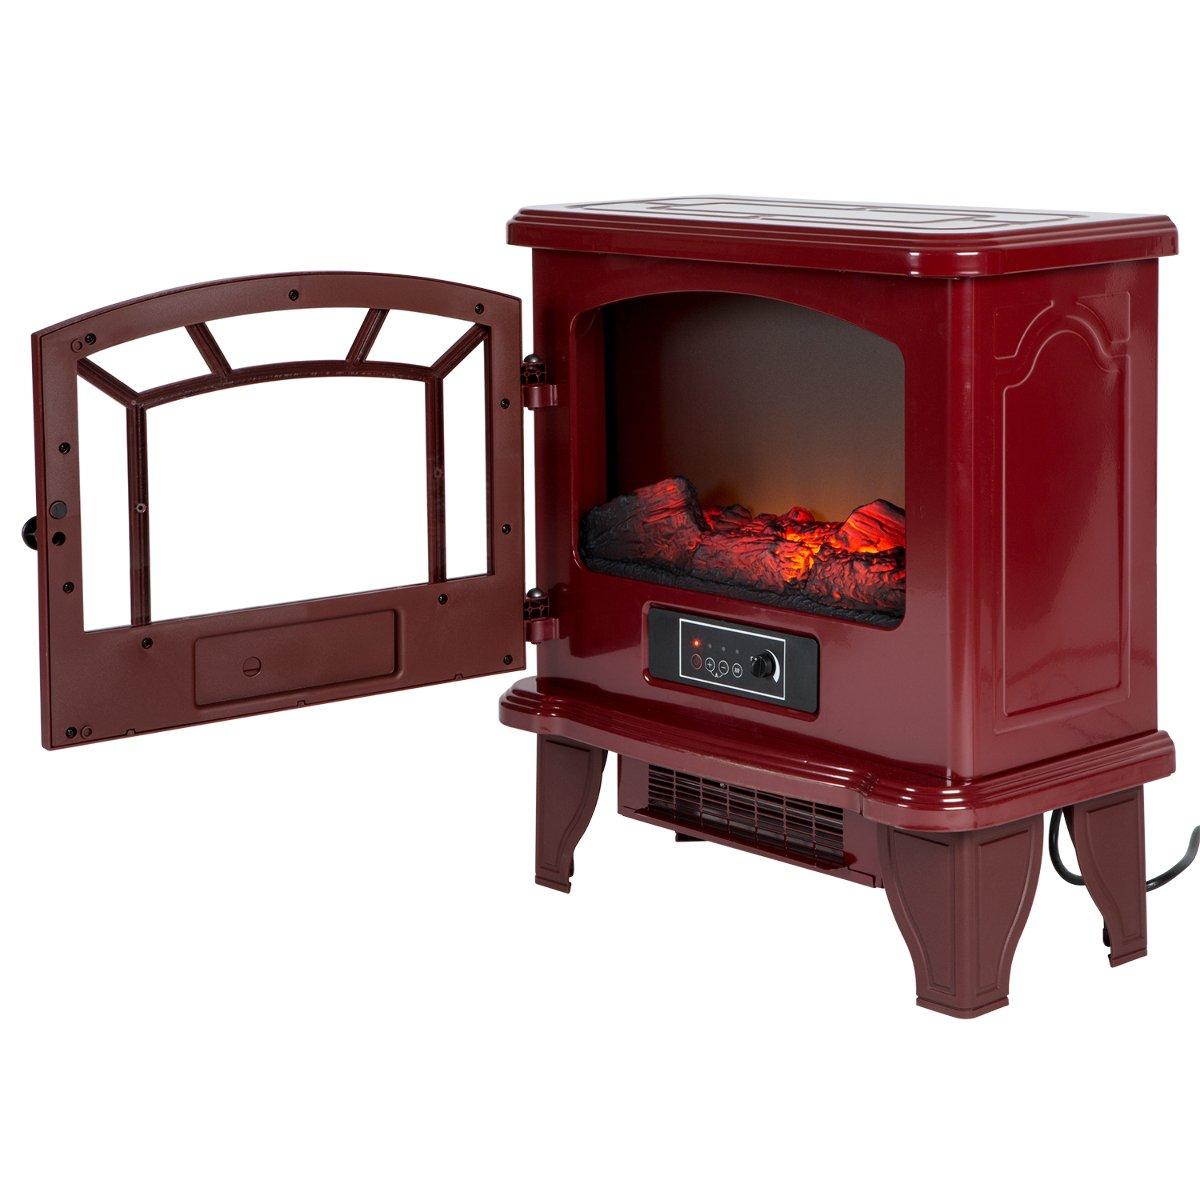 Duraflame DFI 550 22 Infrared Electric Heater